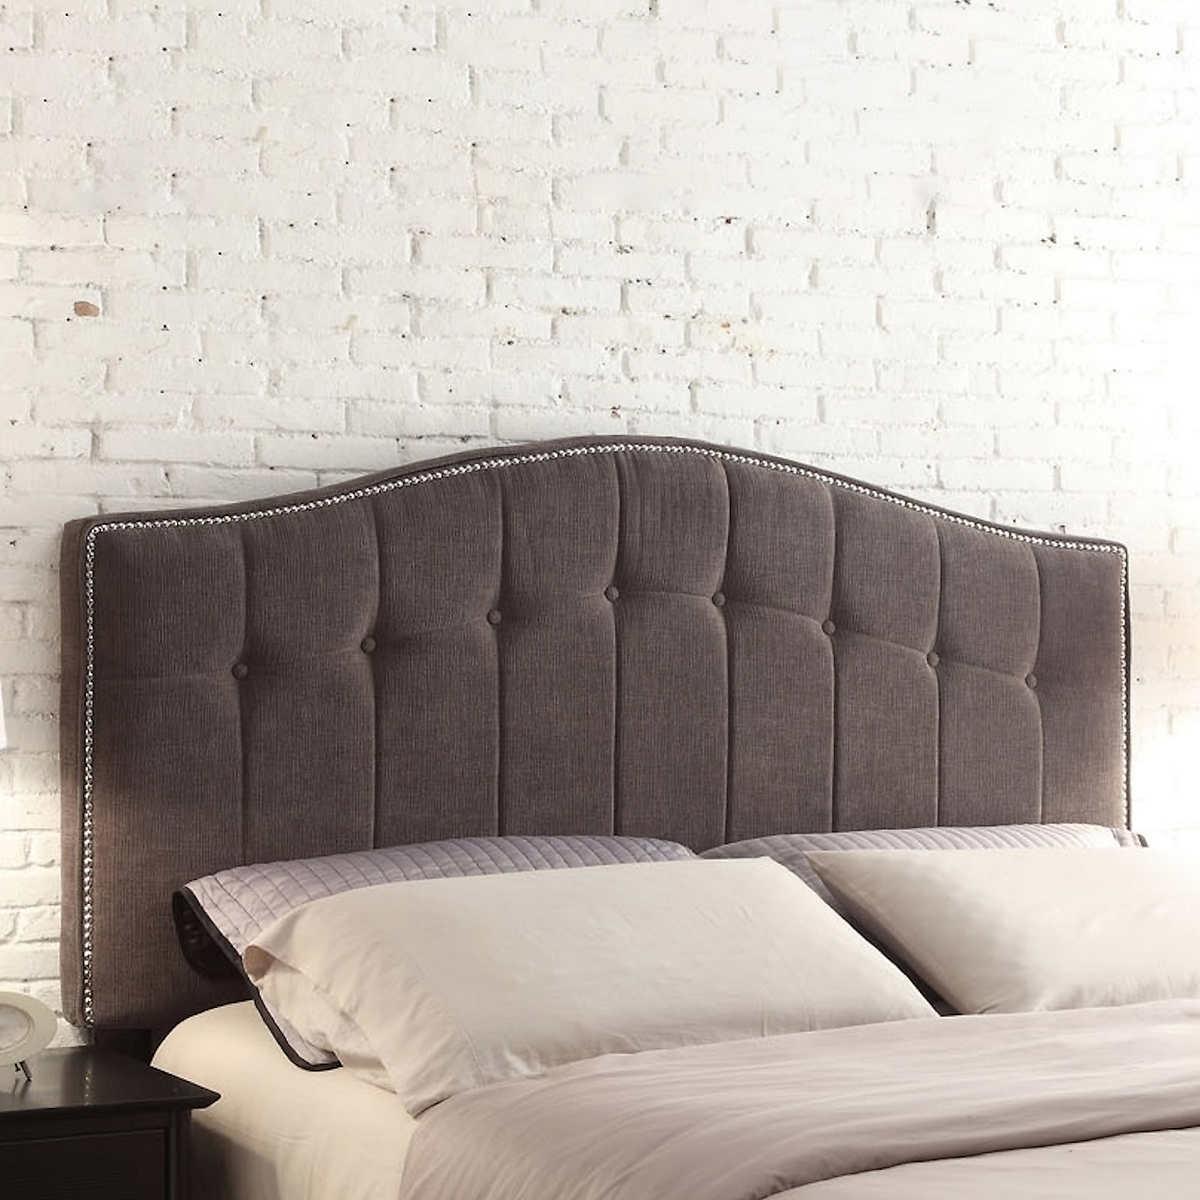 headboards  bed frames  costco, Headboard designs